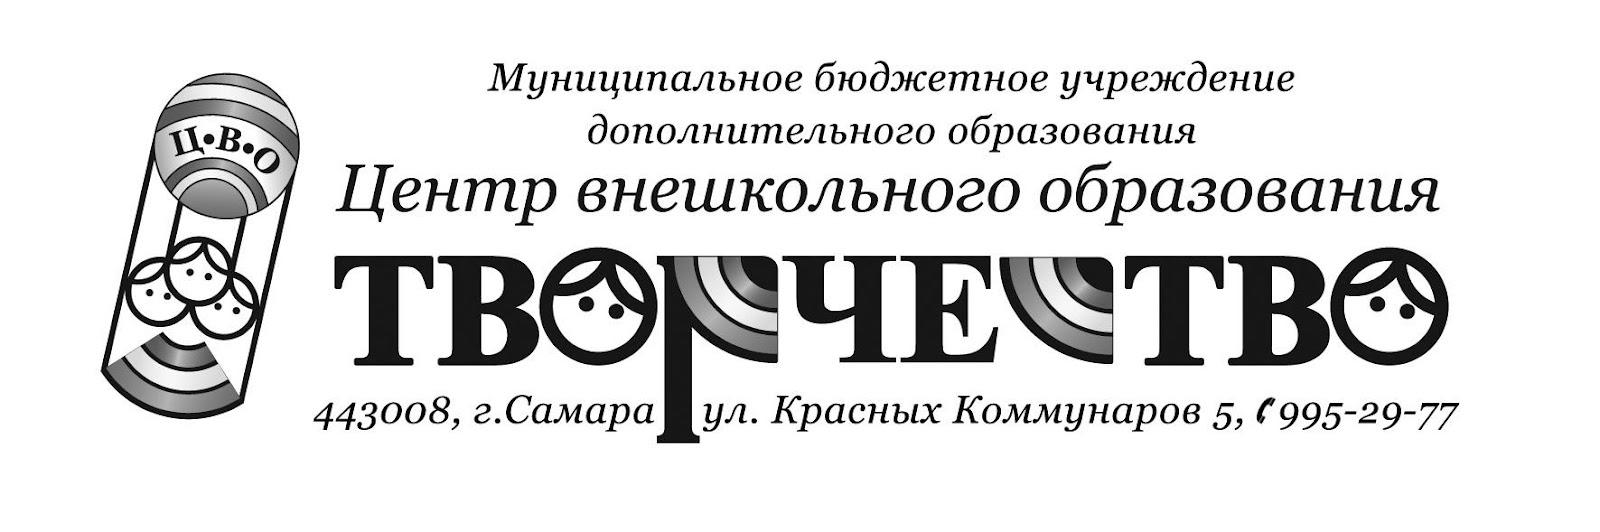 C:\Елена док\Документация\логотип ЧБ.jpg